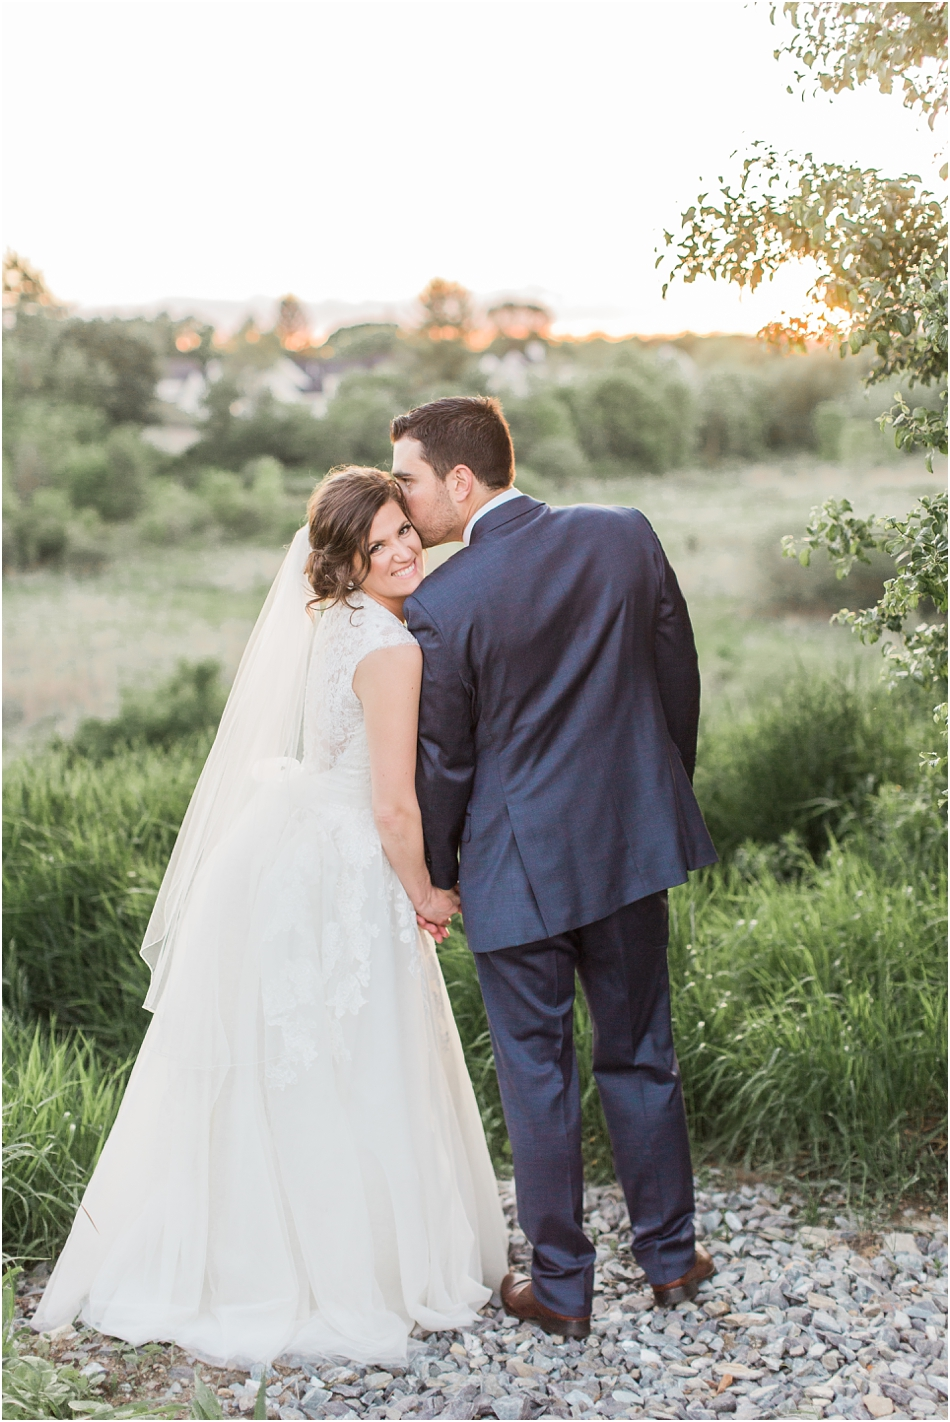 barn_at_gibbett_hill_groton_boston_massachusetts_cape_cod_new_england_wedding_photographer_Meredith_Jane_Photography_photo_1546.jpg